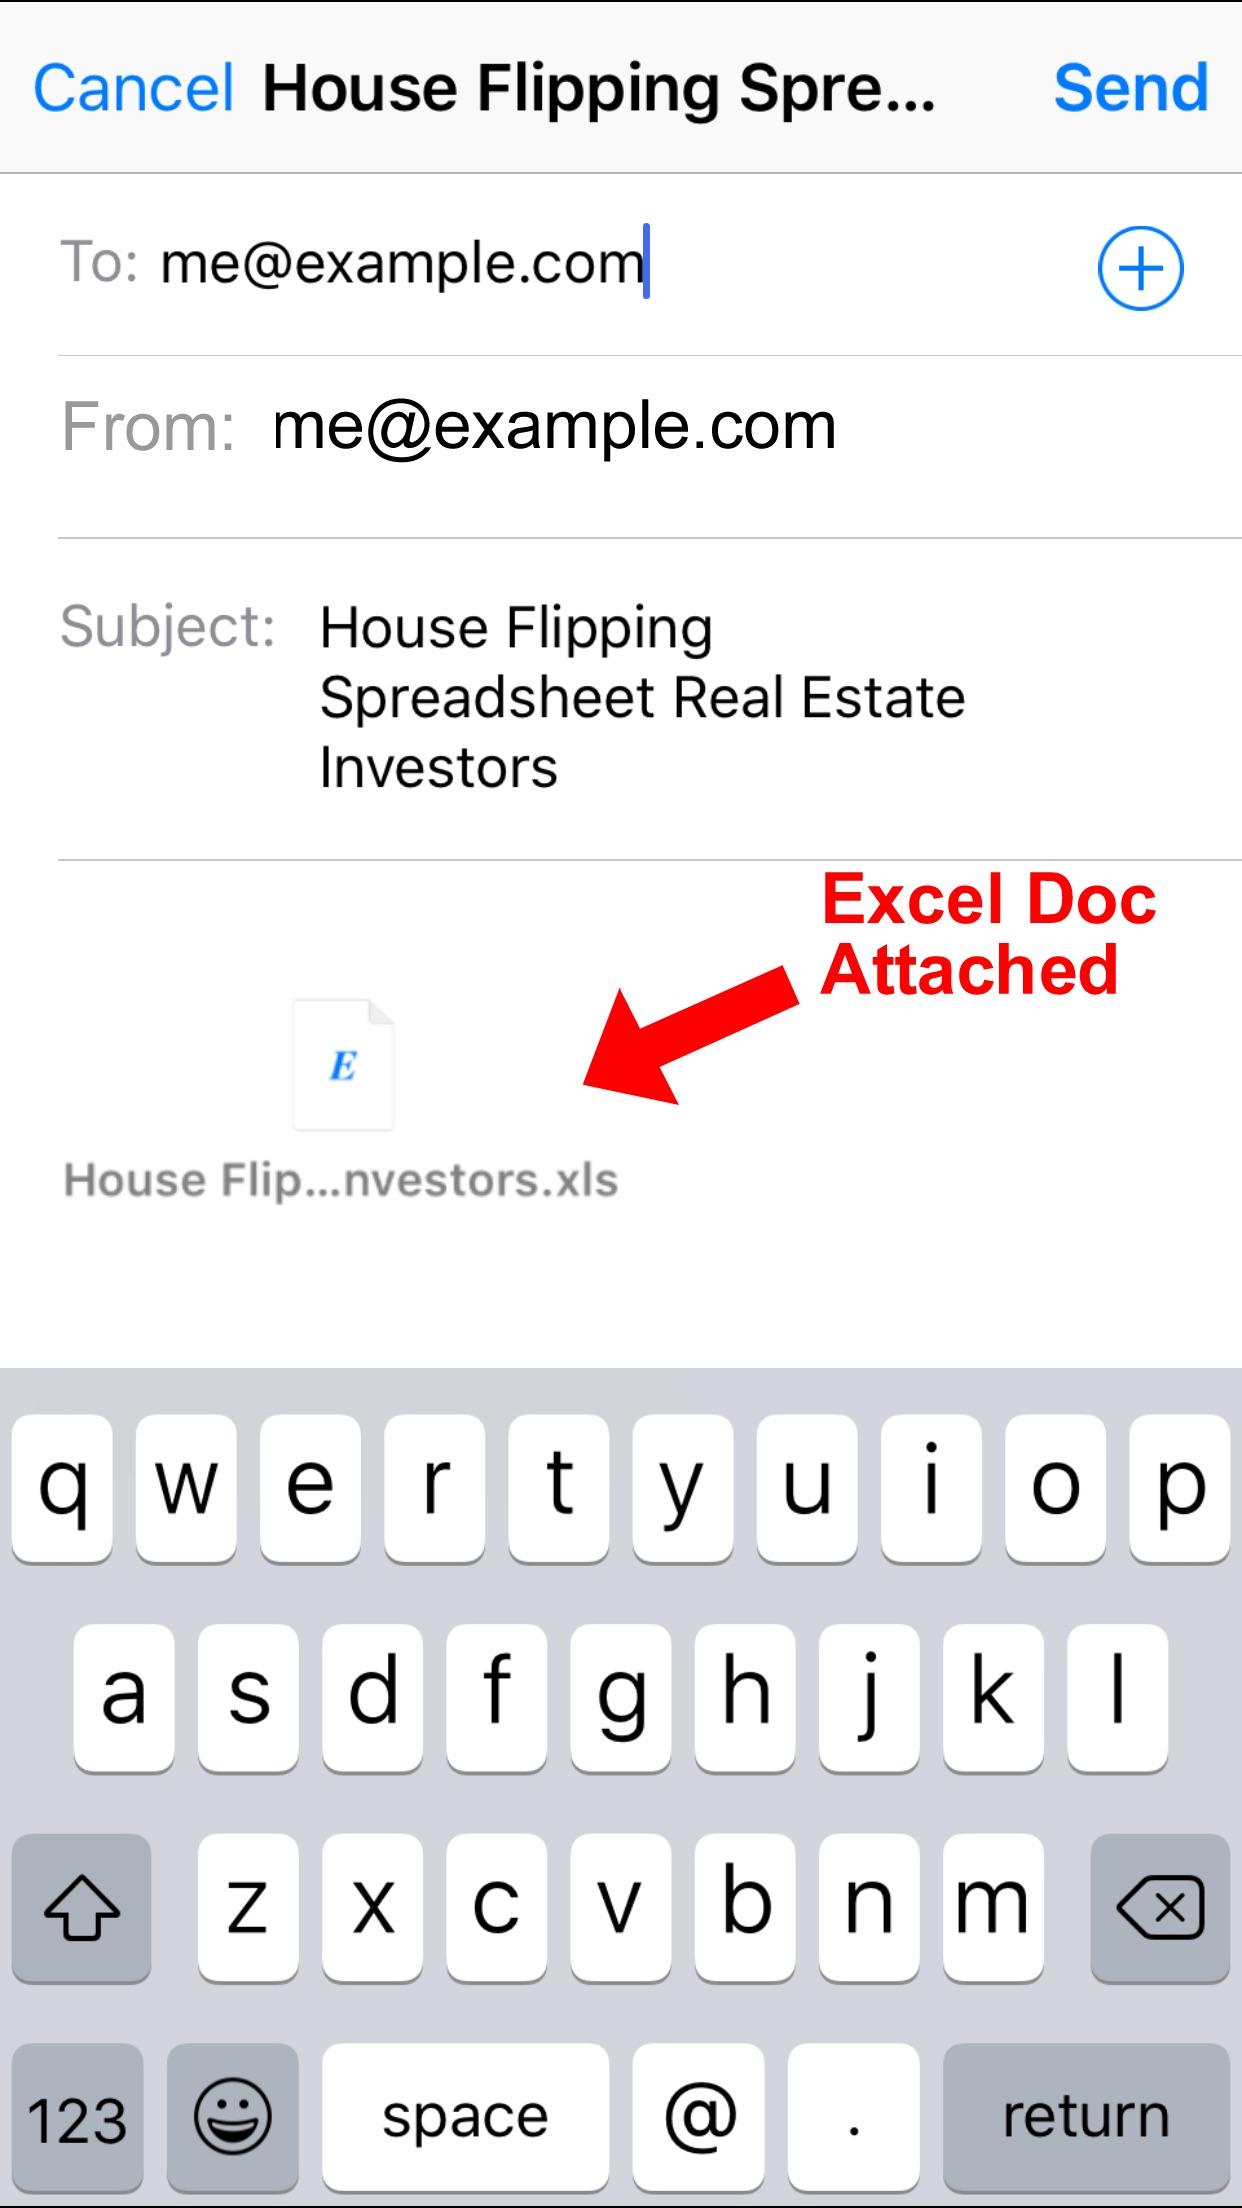 House Flipping Spreadsheet Real Estate Investors Screenshot